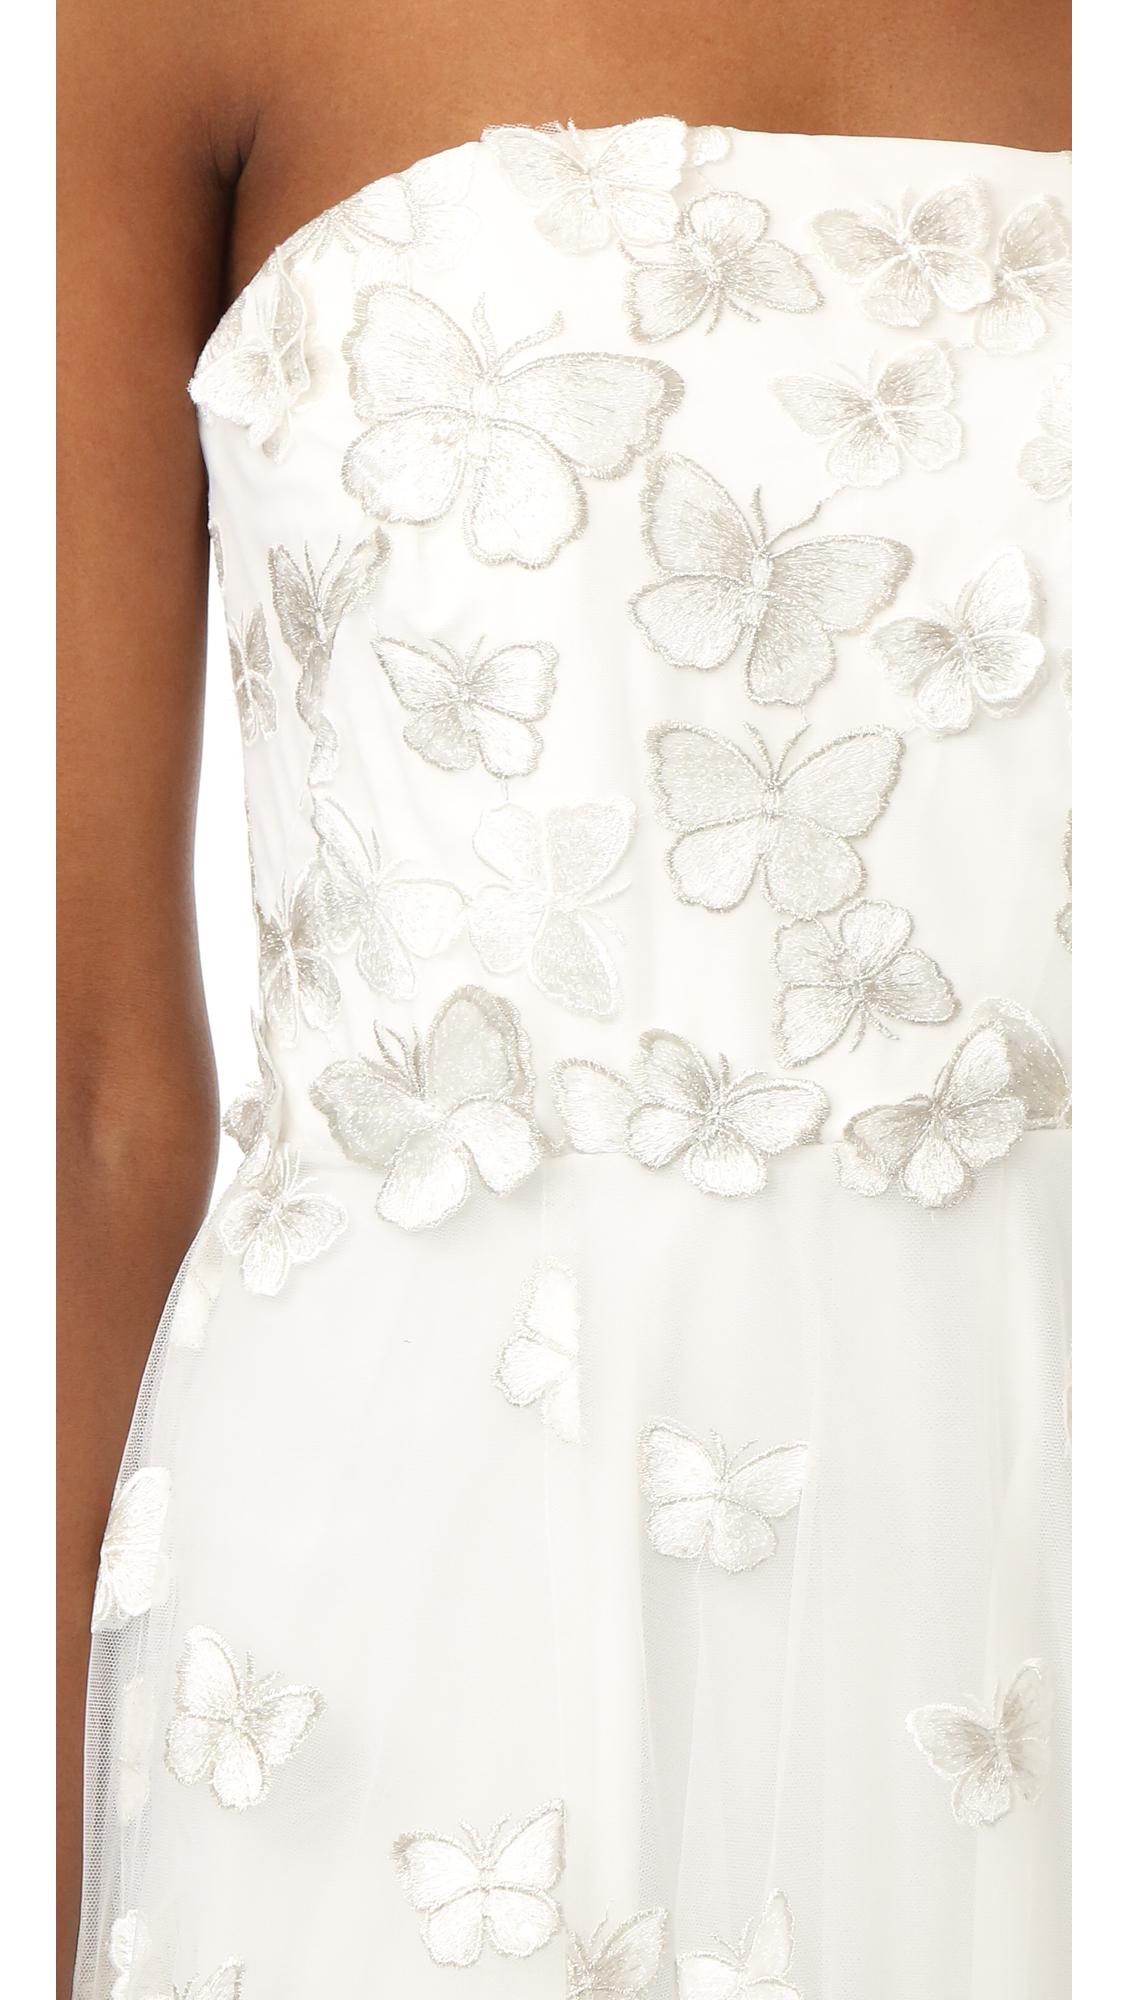 adb18ae1 Marchesa Notte Strapless Butterfly Dress | SHOPBOP